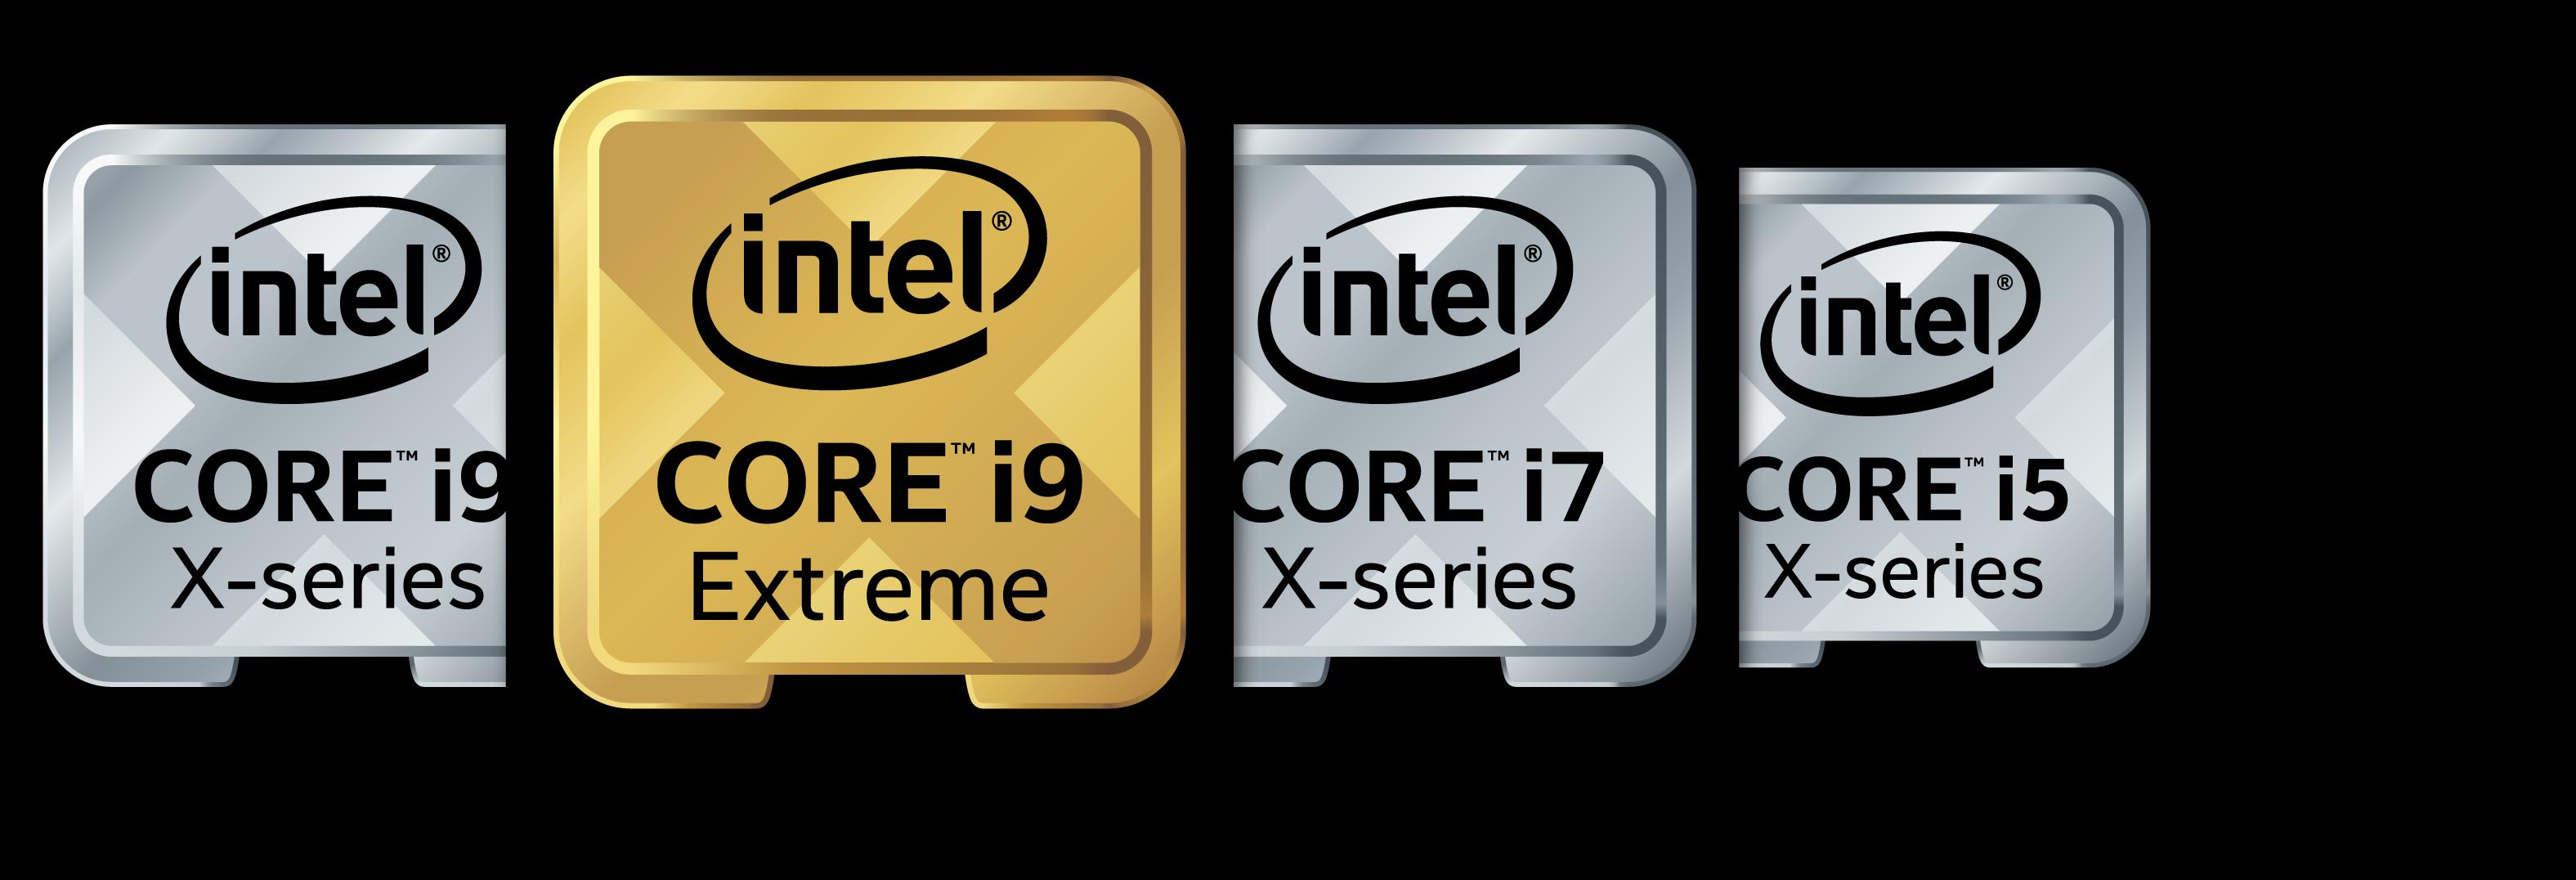 latest 9th generation processors - 1198×675